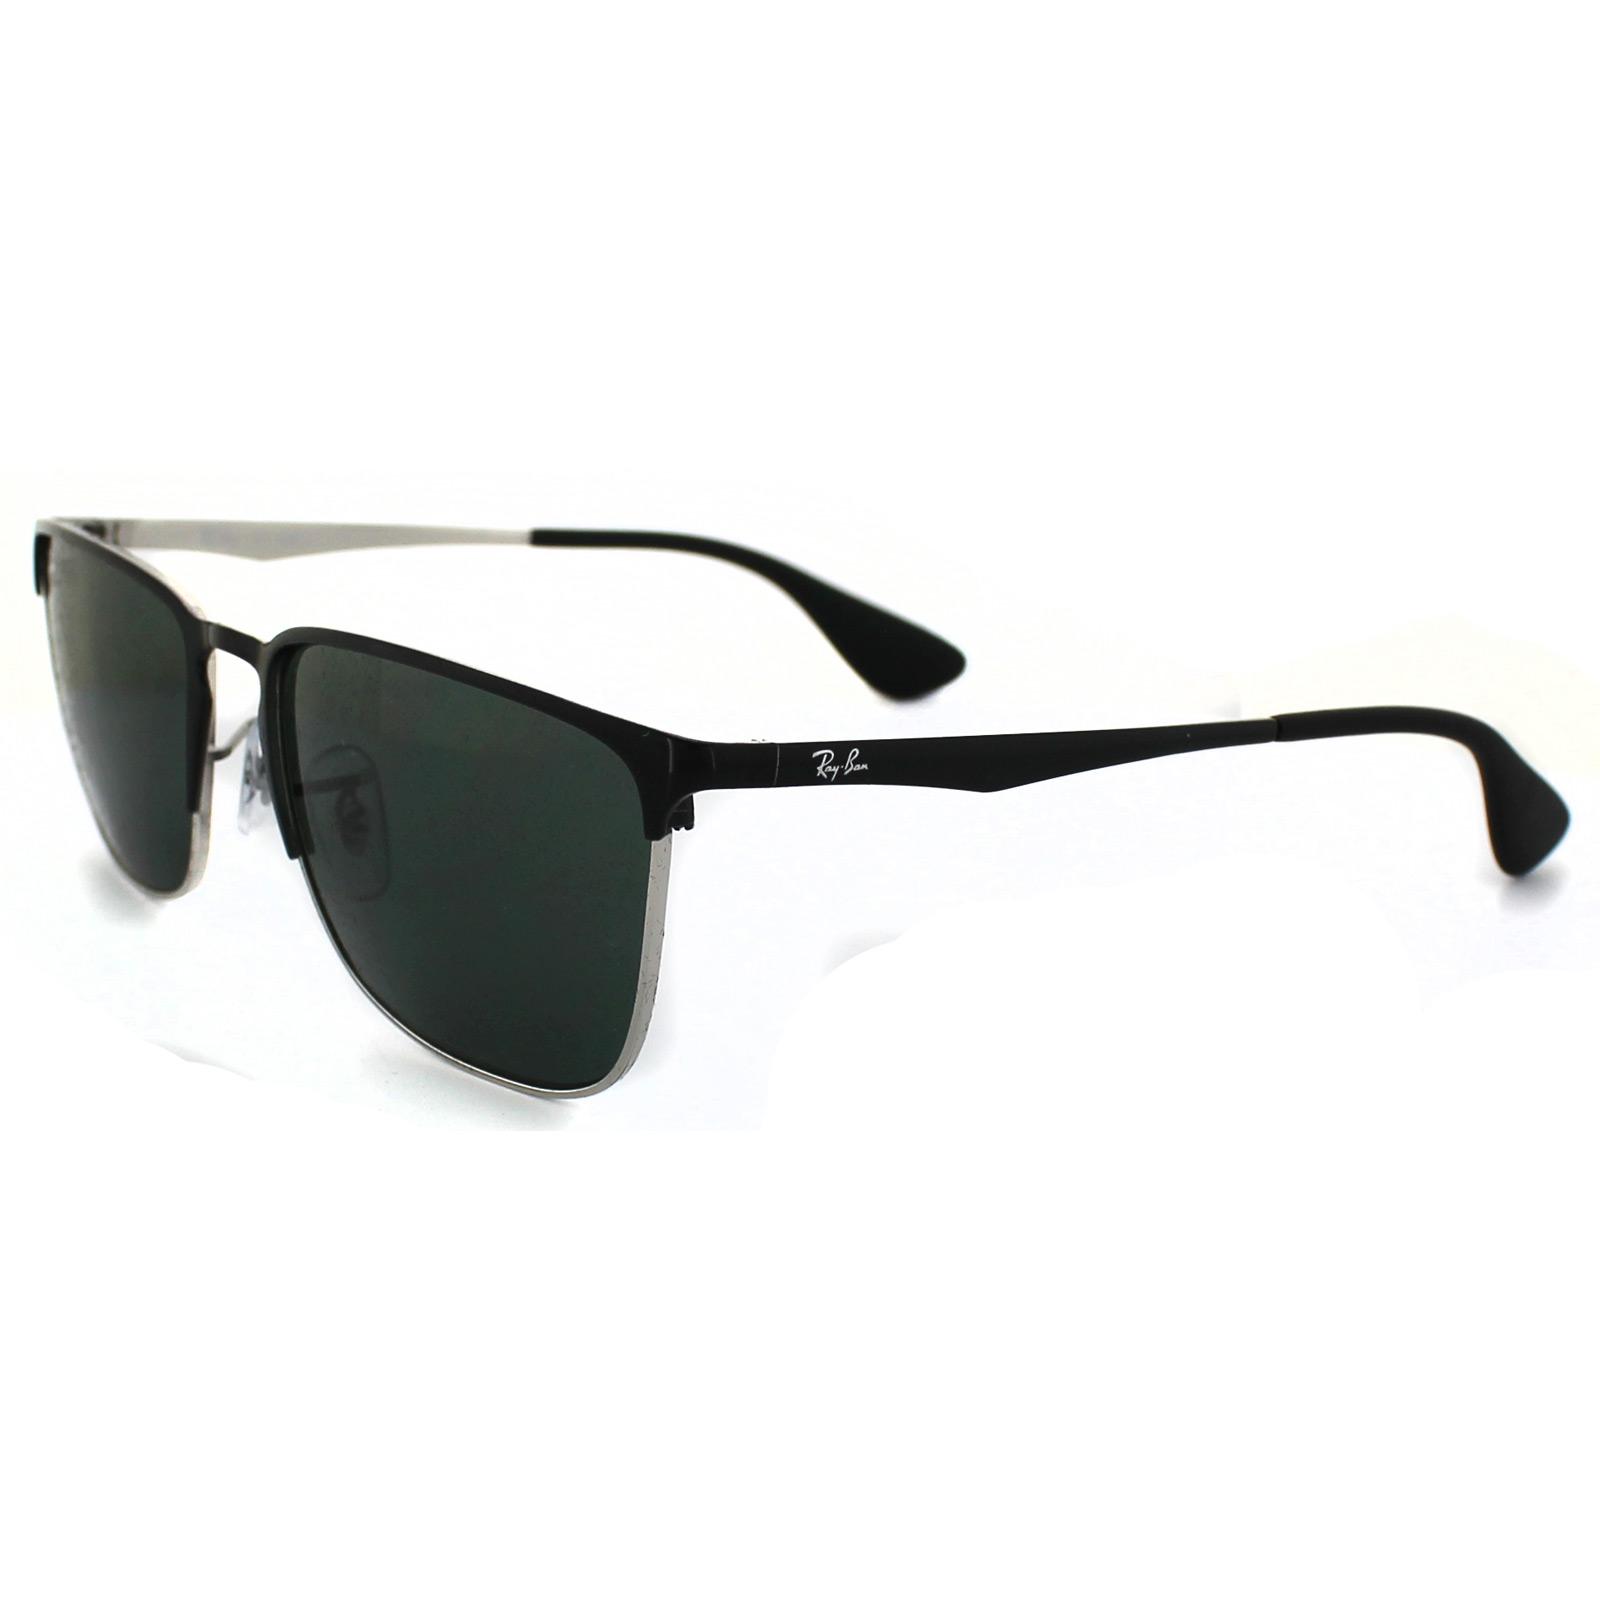 Ray-Ban Junior : Designer Sunglasses \u0026amp; Glasses Online UK \u2026 \u201cCheap